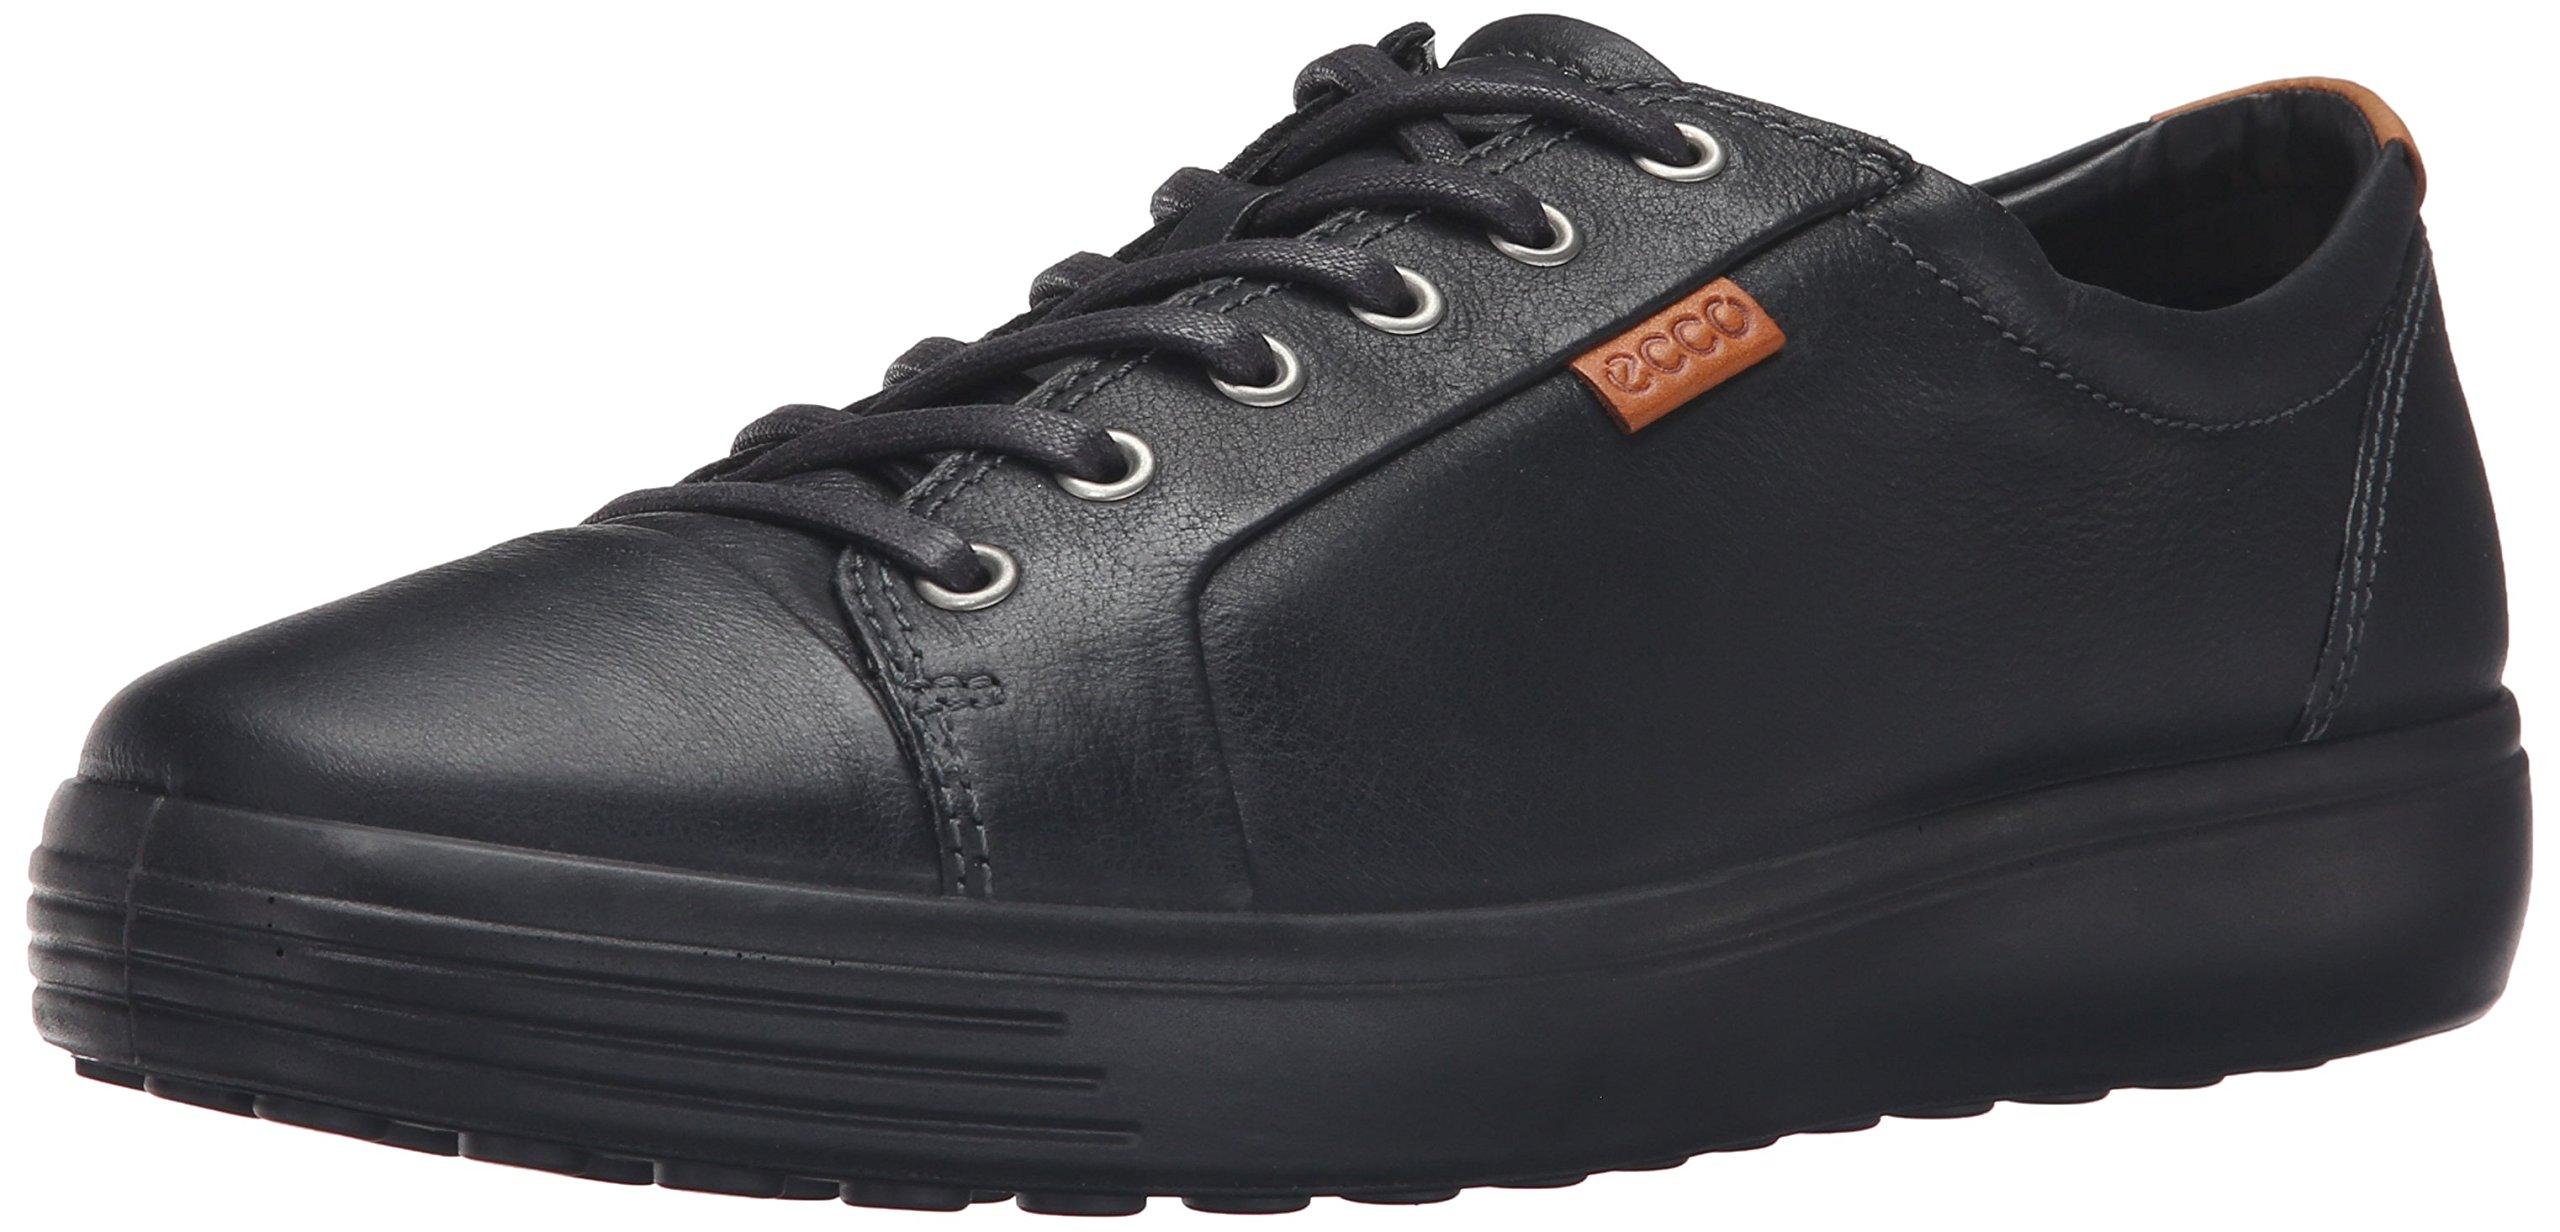 ECCO Men's Soft 7 Tie Fashion Sneaker, Black, 45 EU / 11-11.5 US